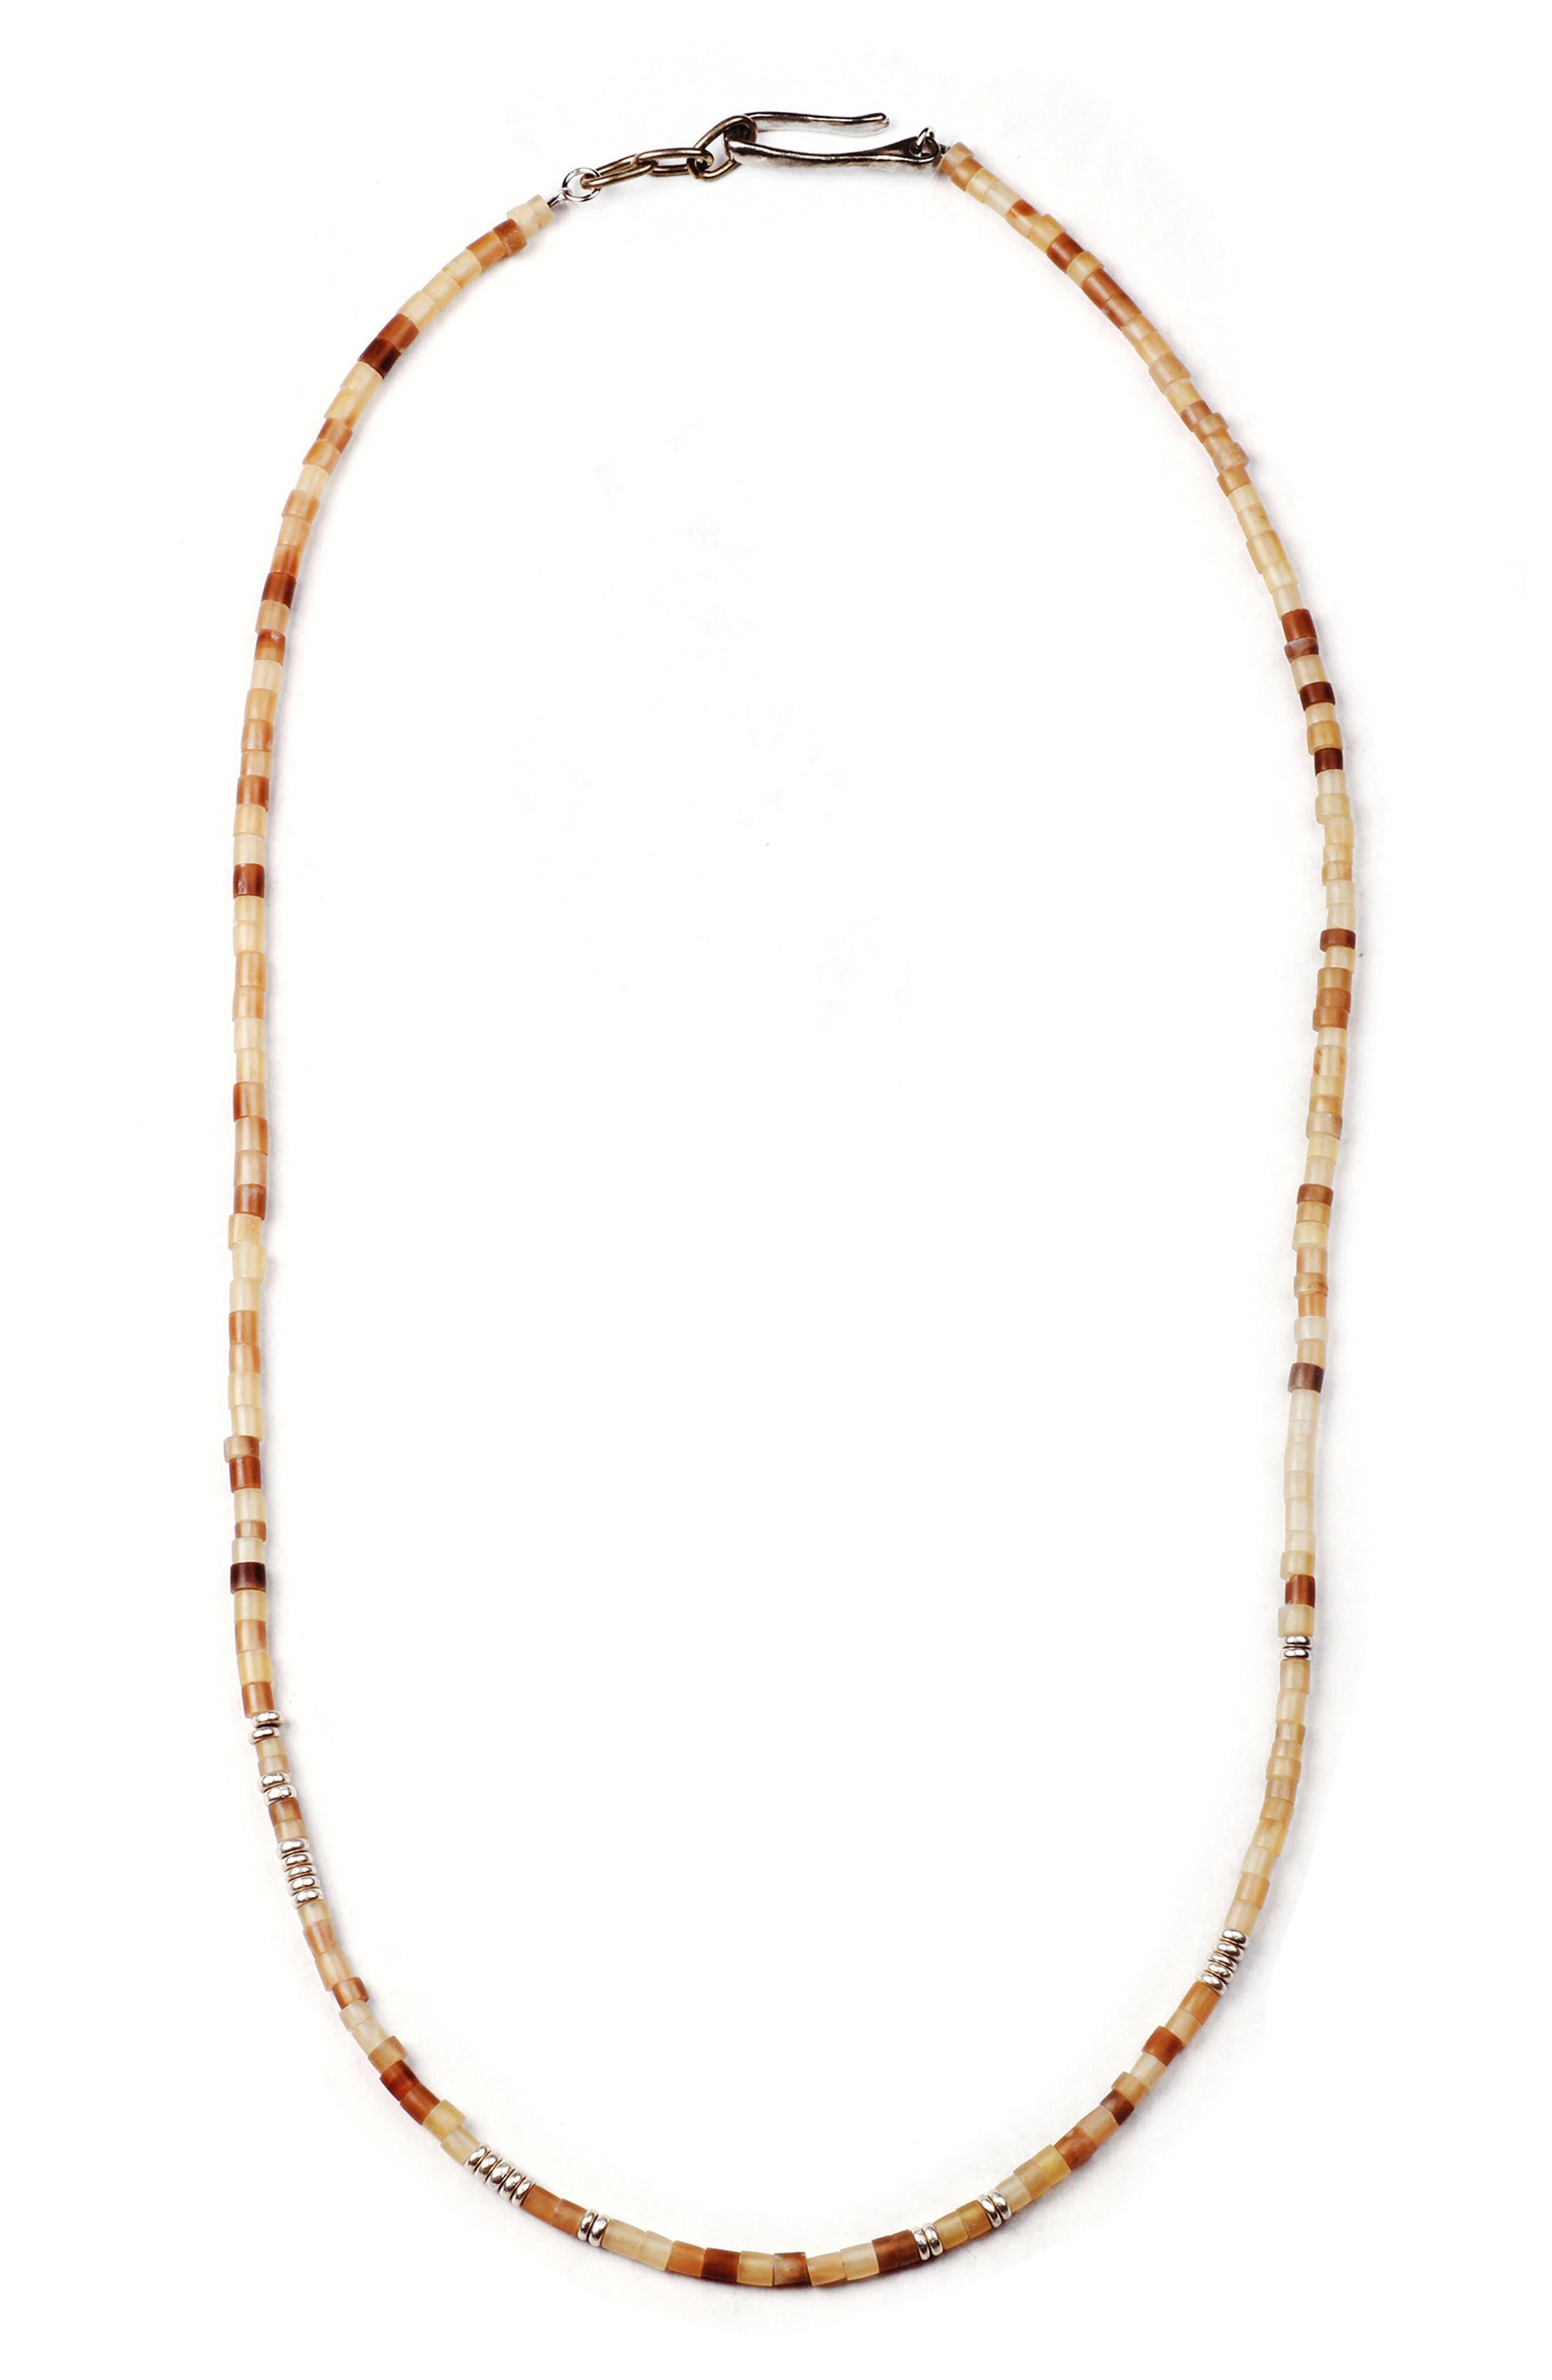 George Frost Unite Morse Necklace